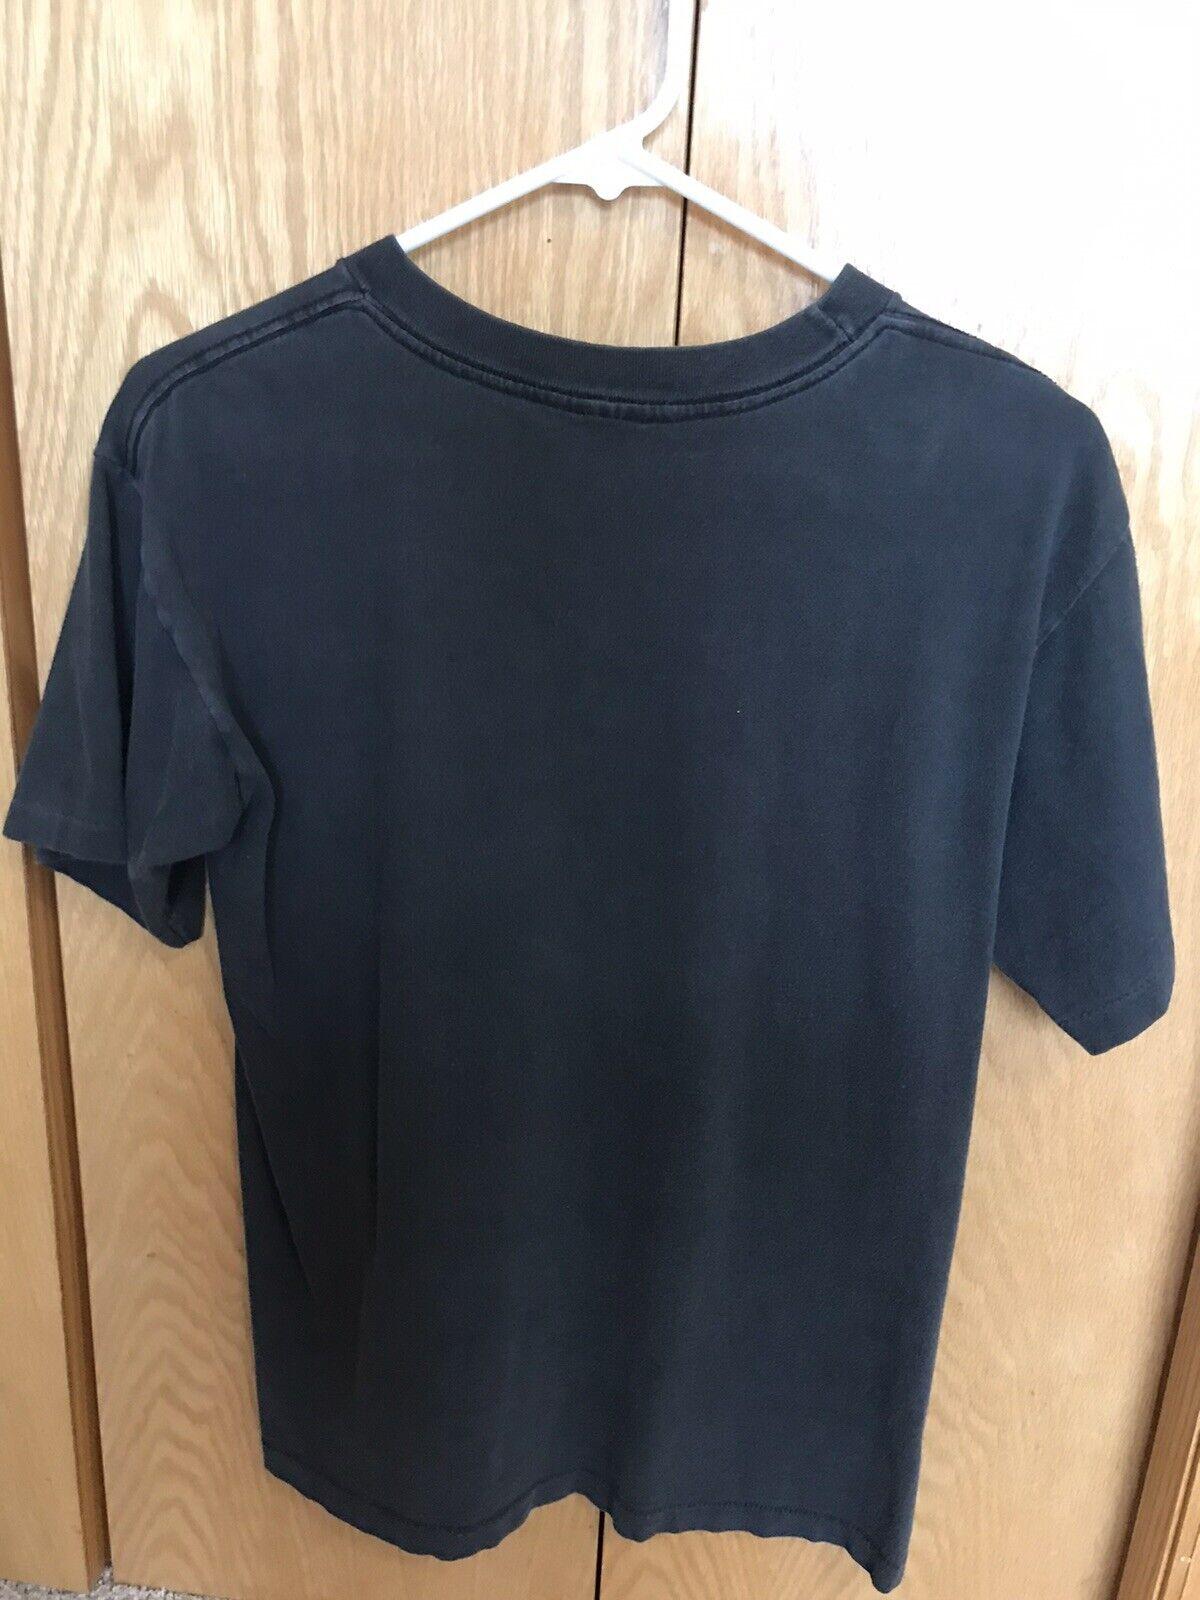 Magic Johnson 89-90 MVP Vintage T Shirt Small  - image 2